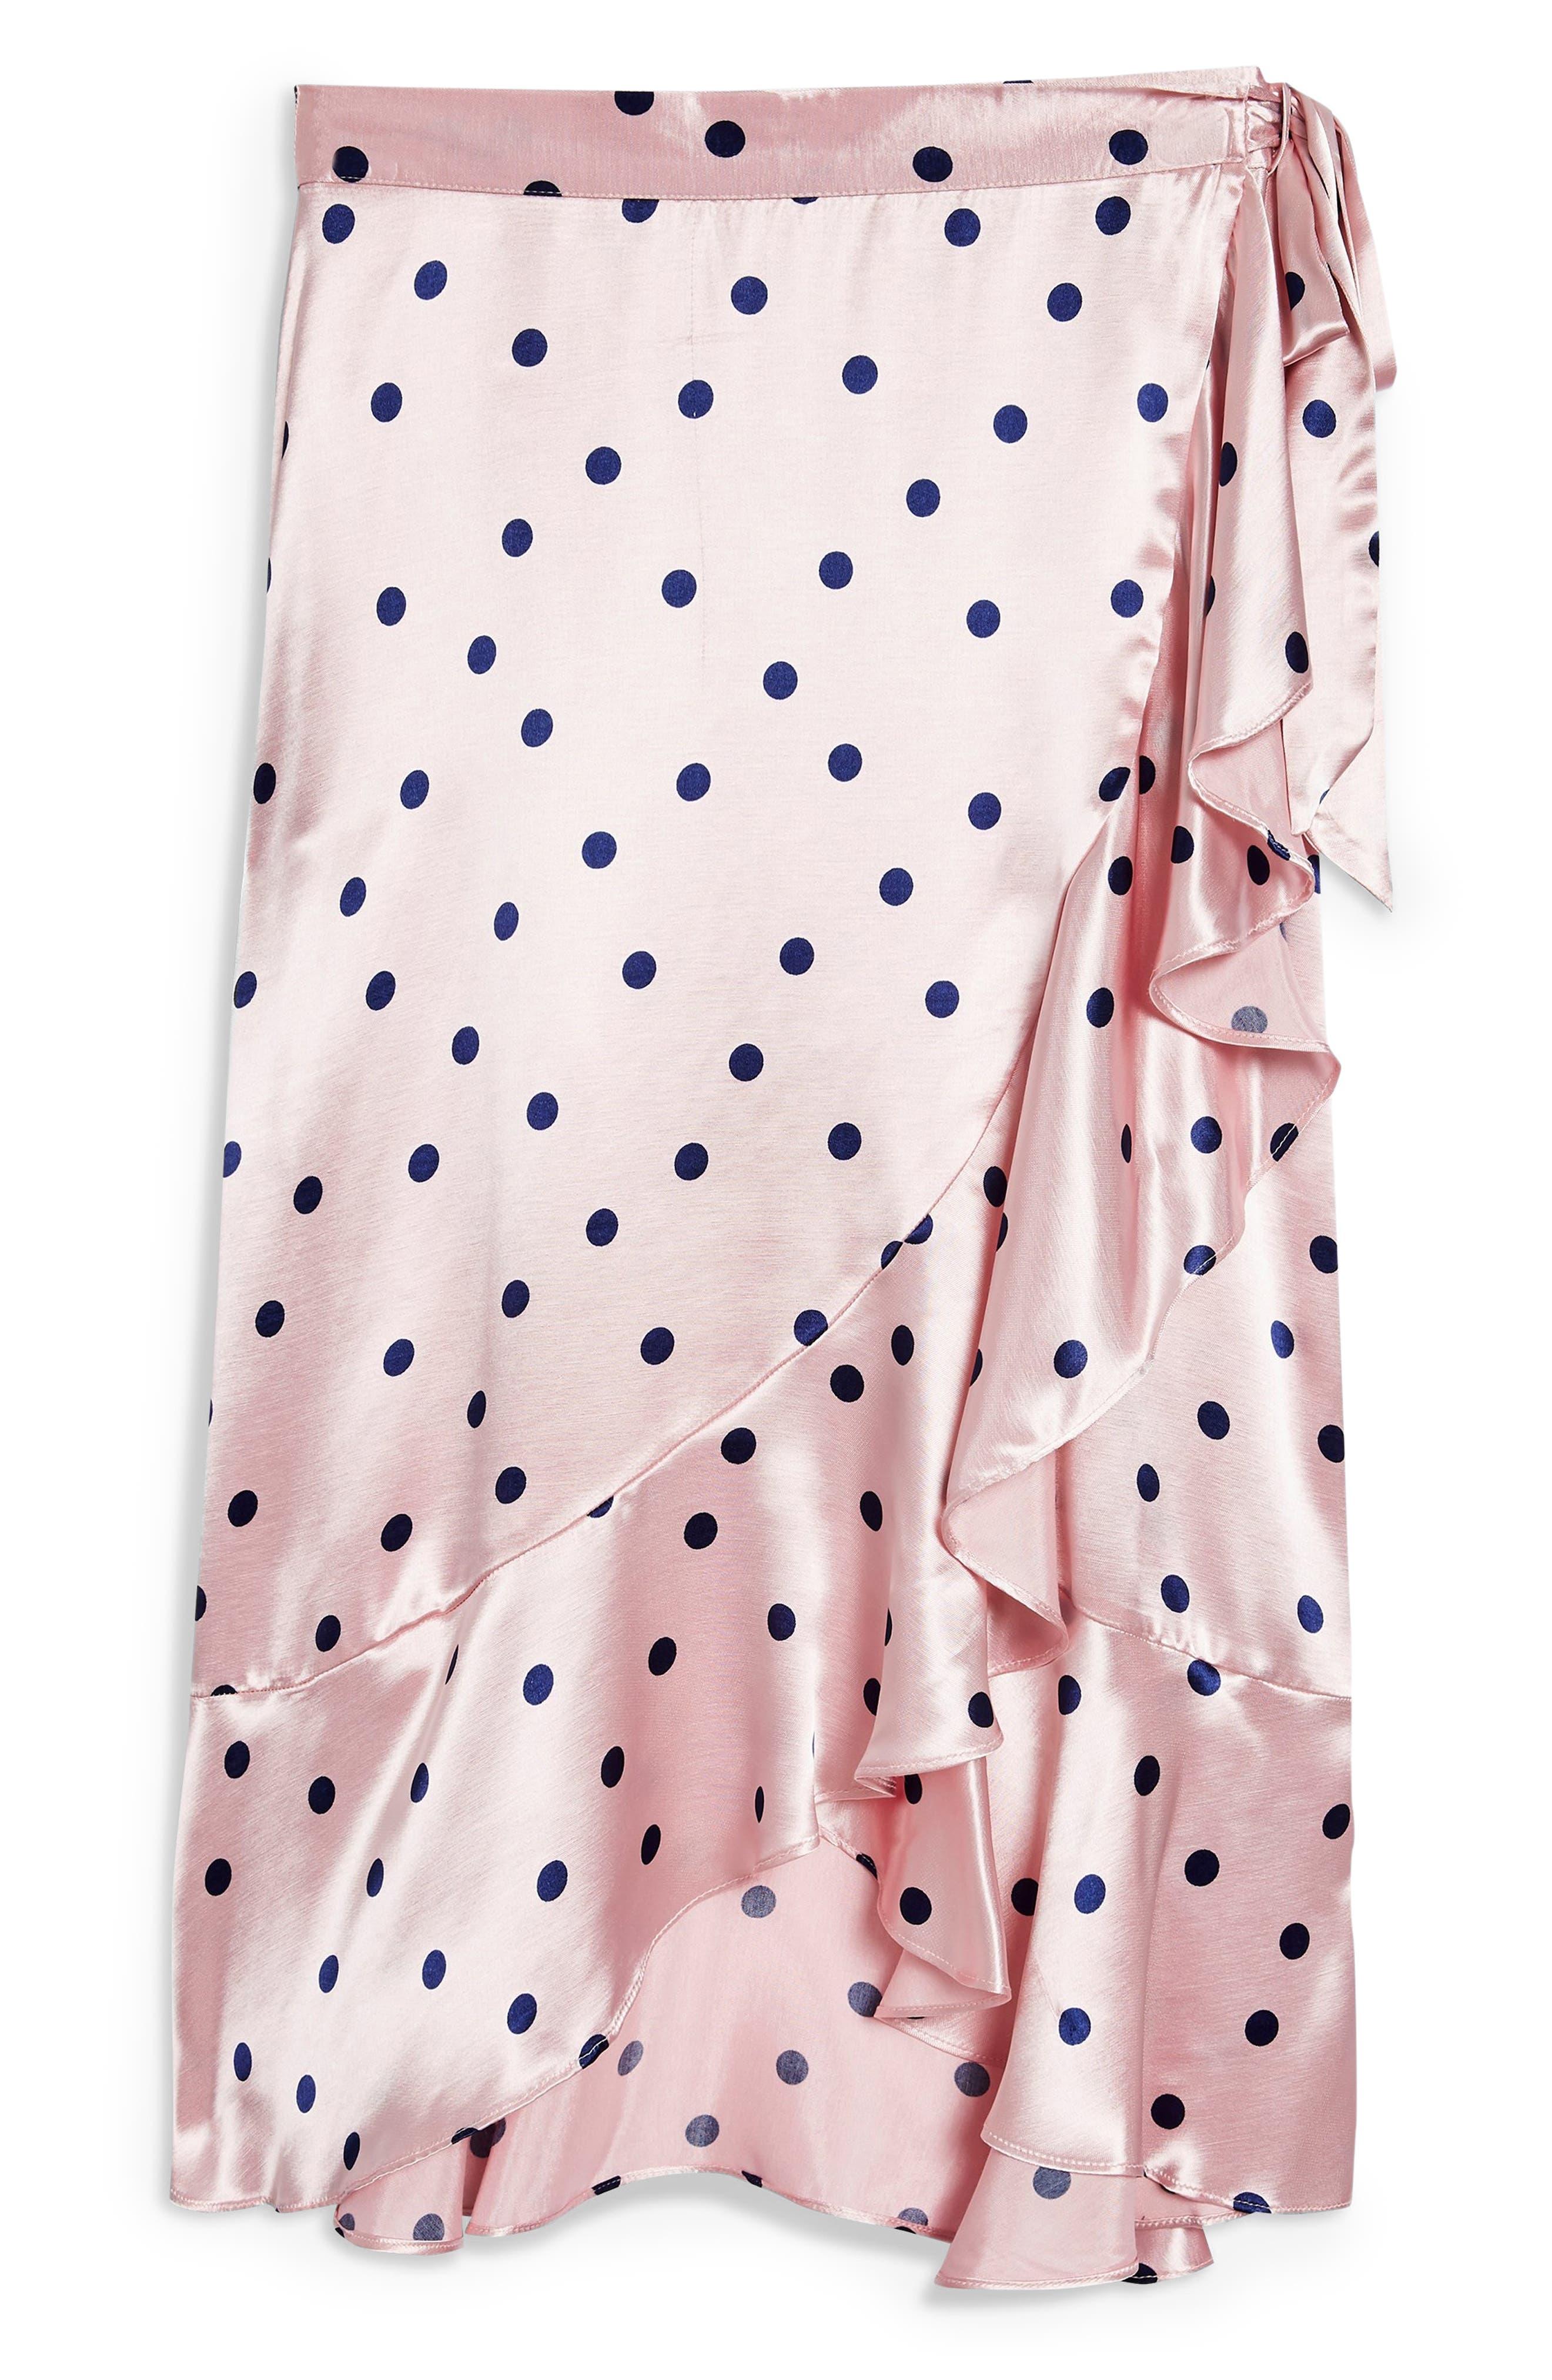 Satin Spot Ruffle Skirt,                             Alternate thumbnail 3, color,                             PINK MULTI